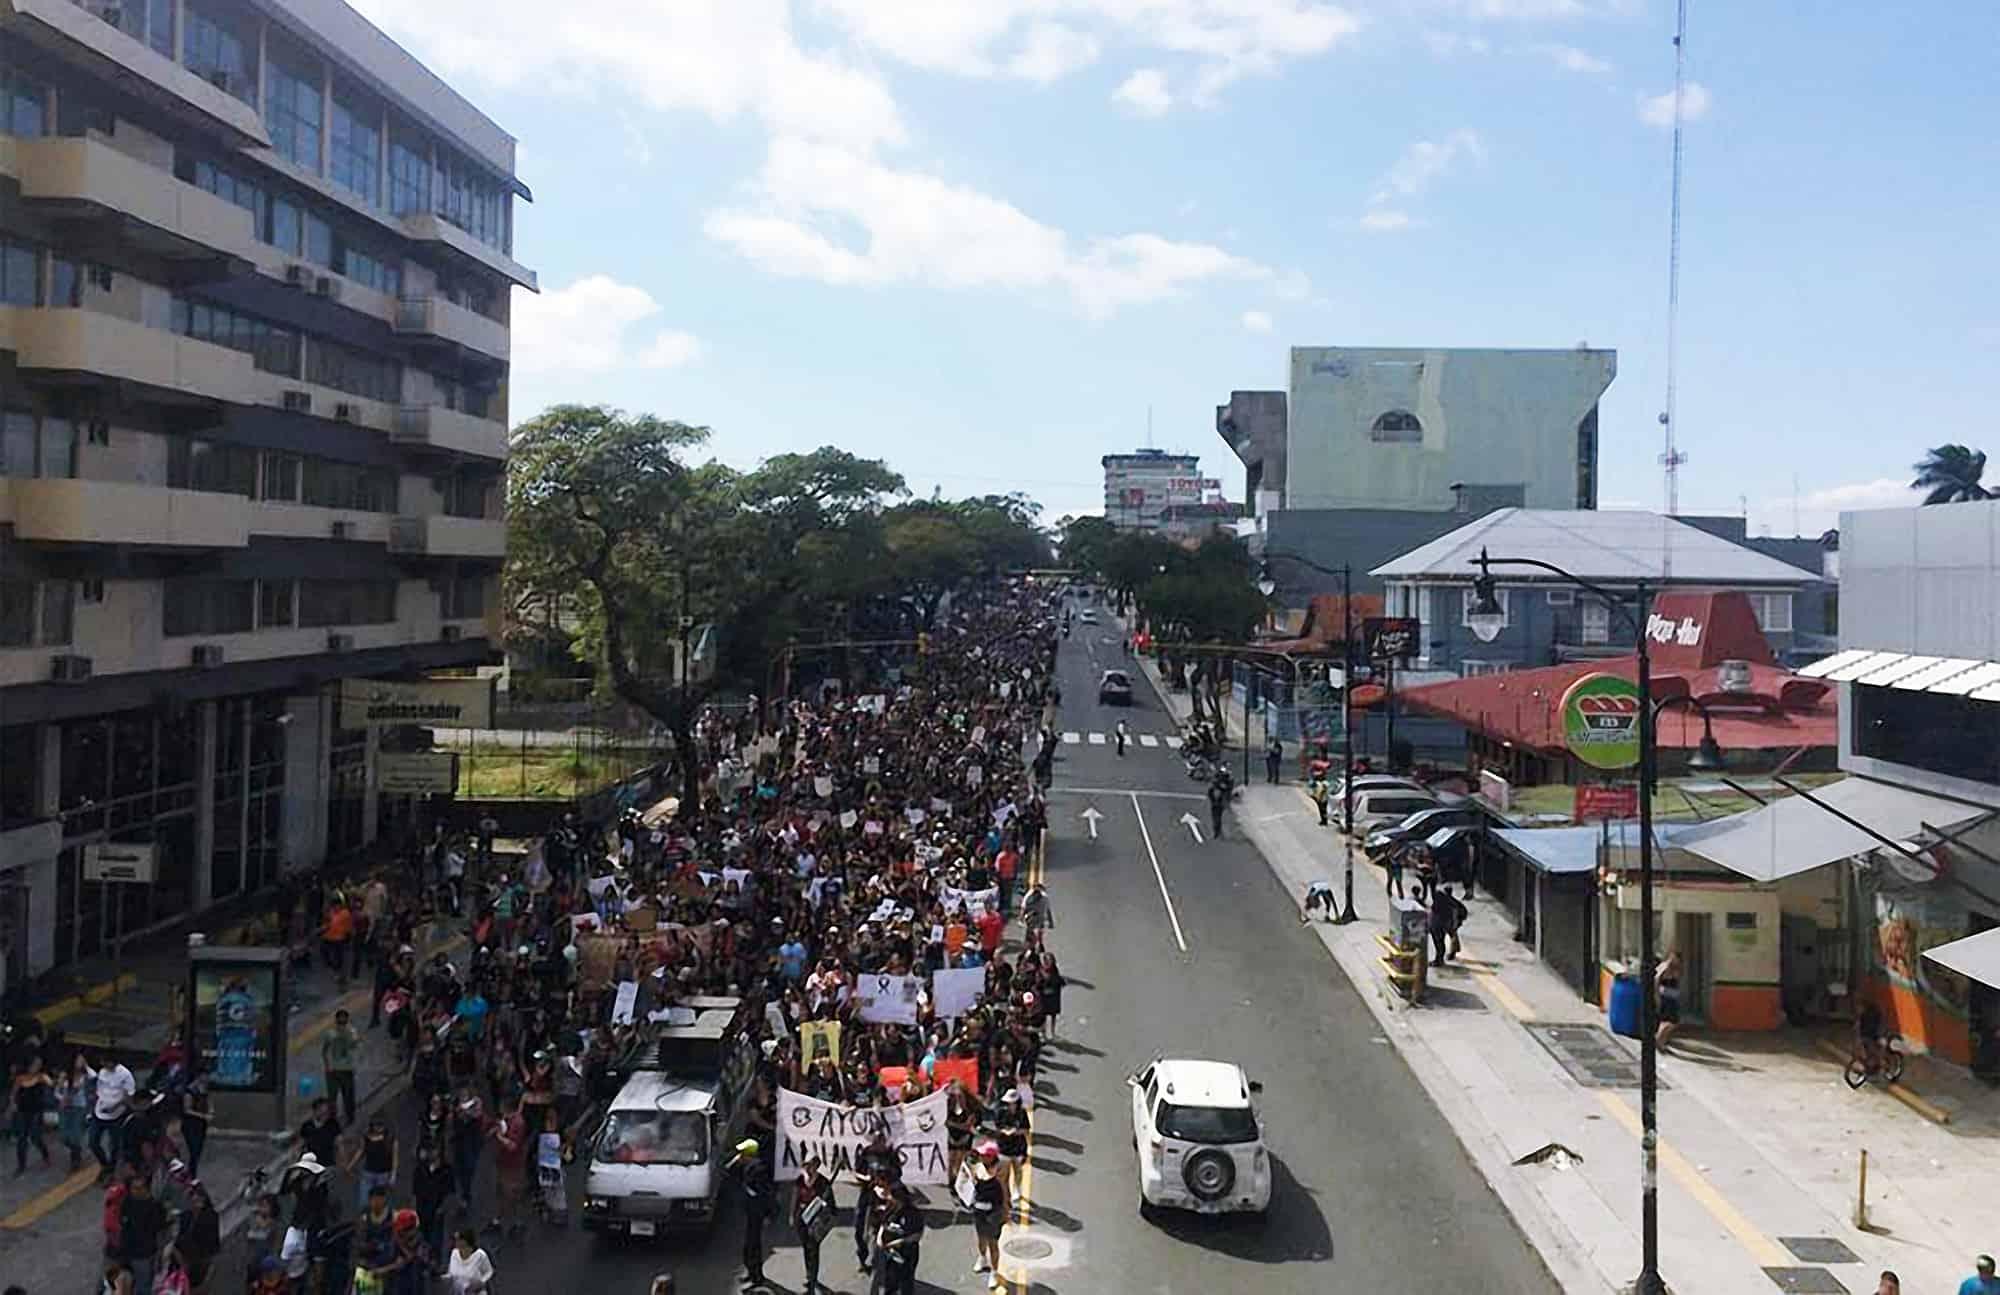 Animal welfare advocates march on Feb. 1, 2015